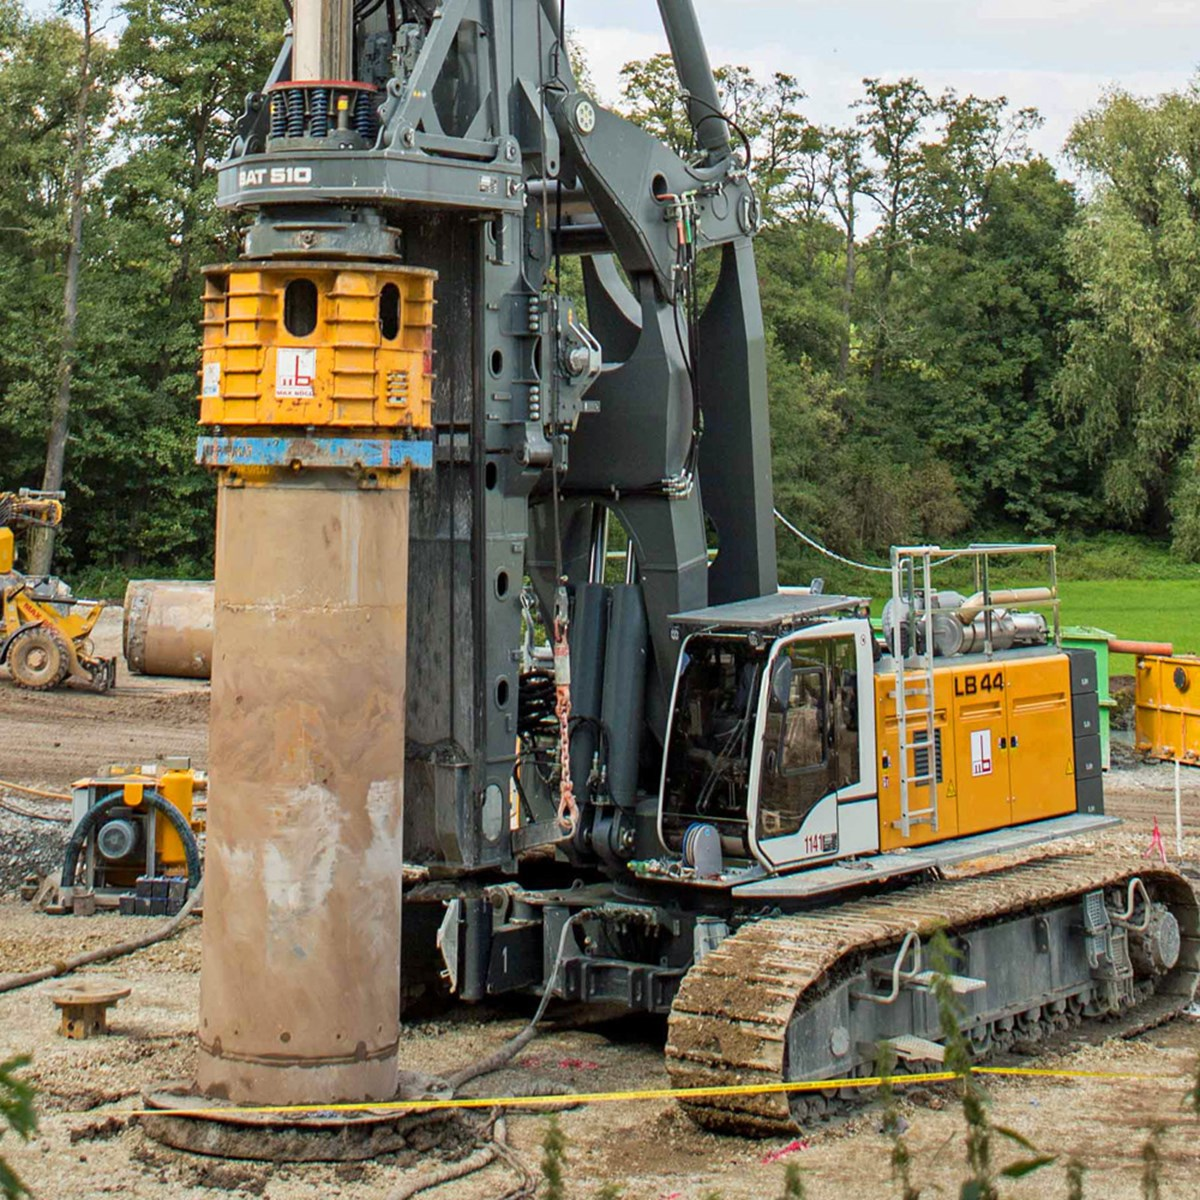 liebherr-bat-510-rotary-drive-bohrantrieb-for-lb-44-drilling-rig-kelly-drill-2.jpg